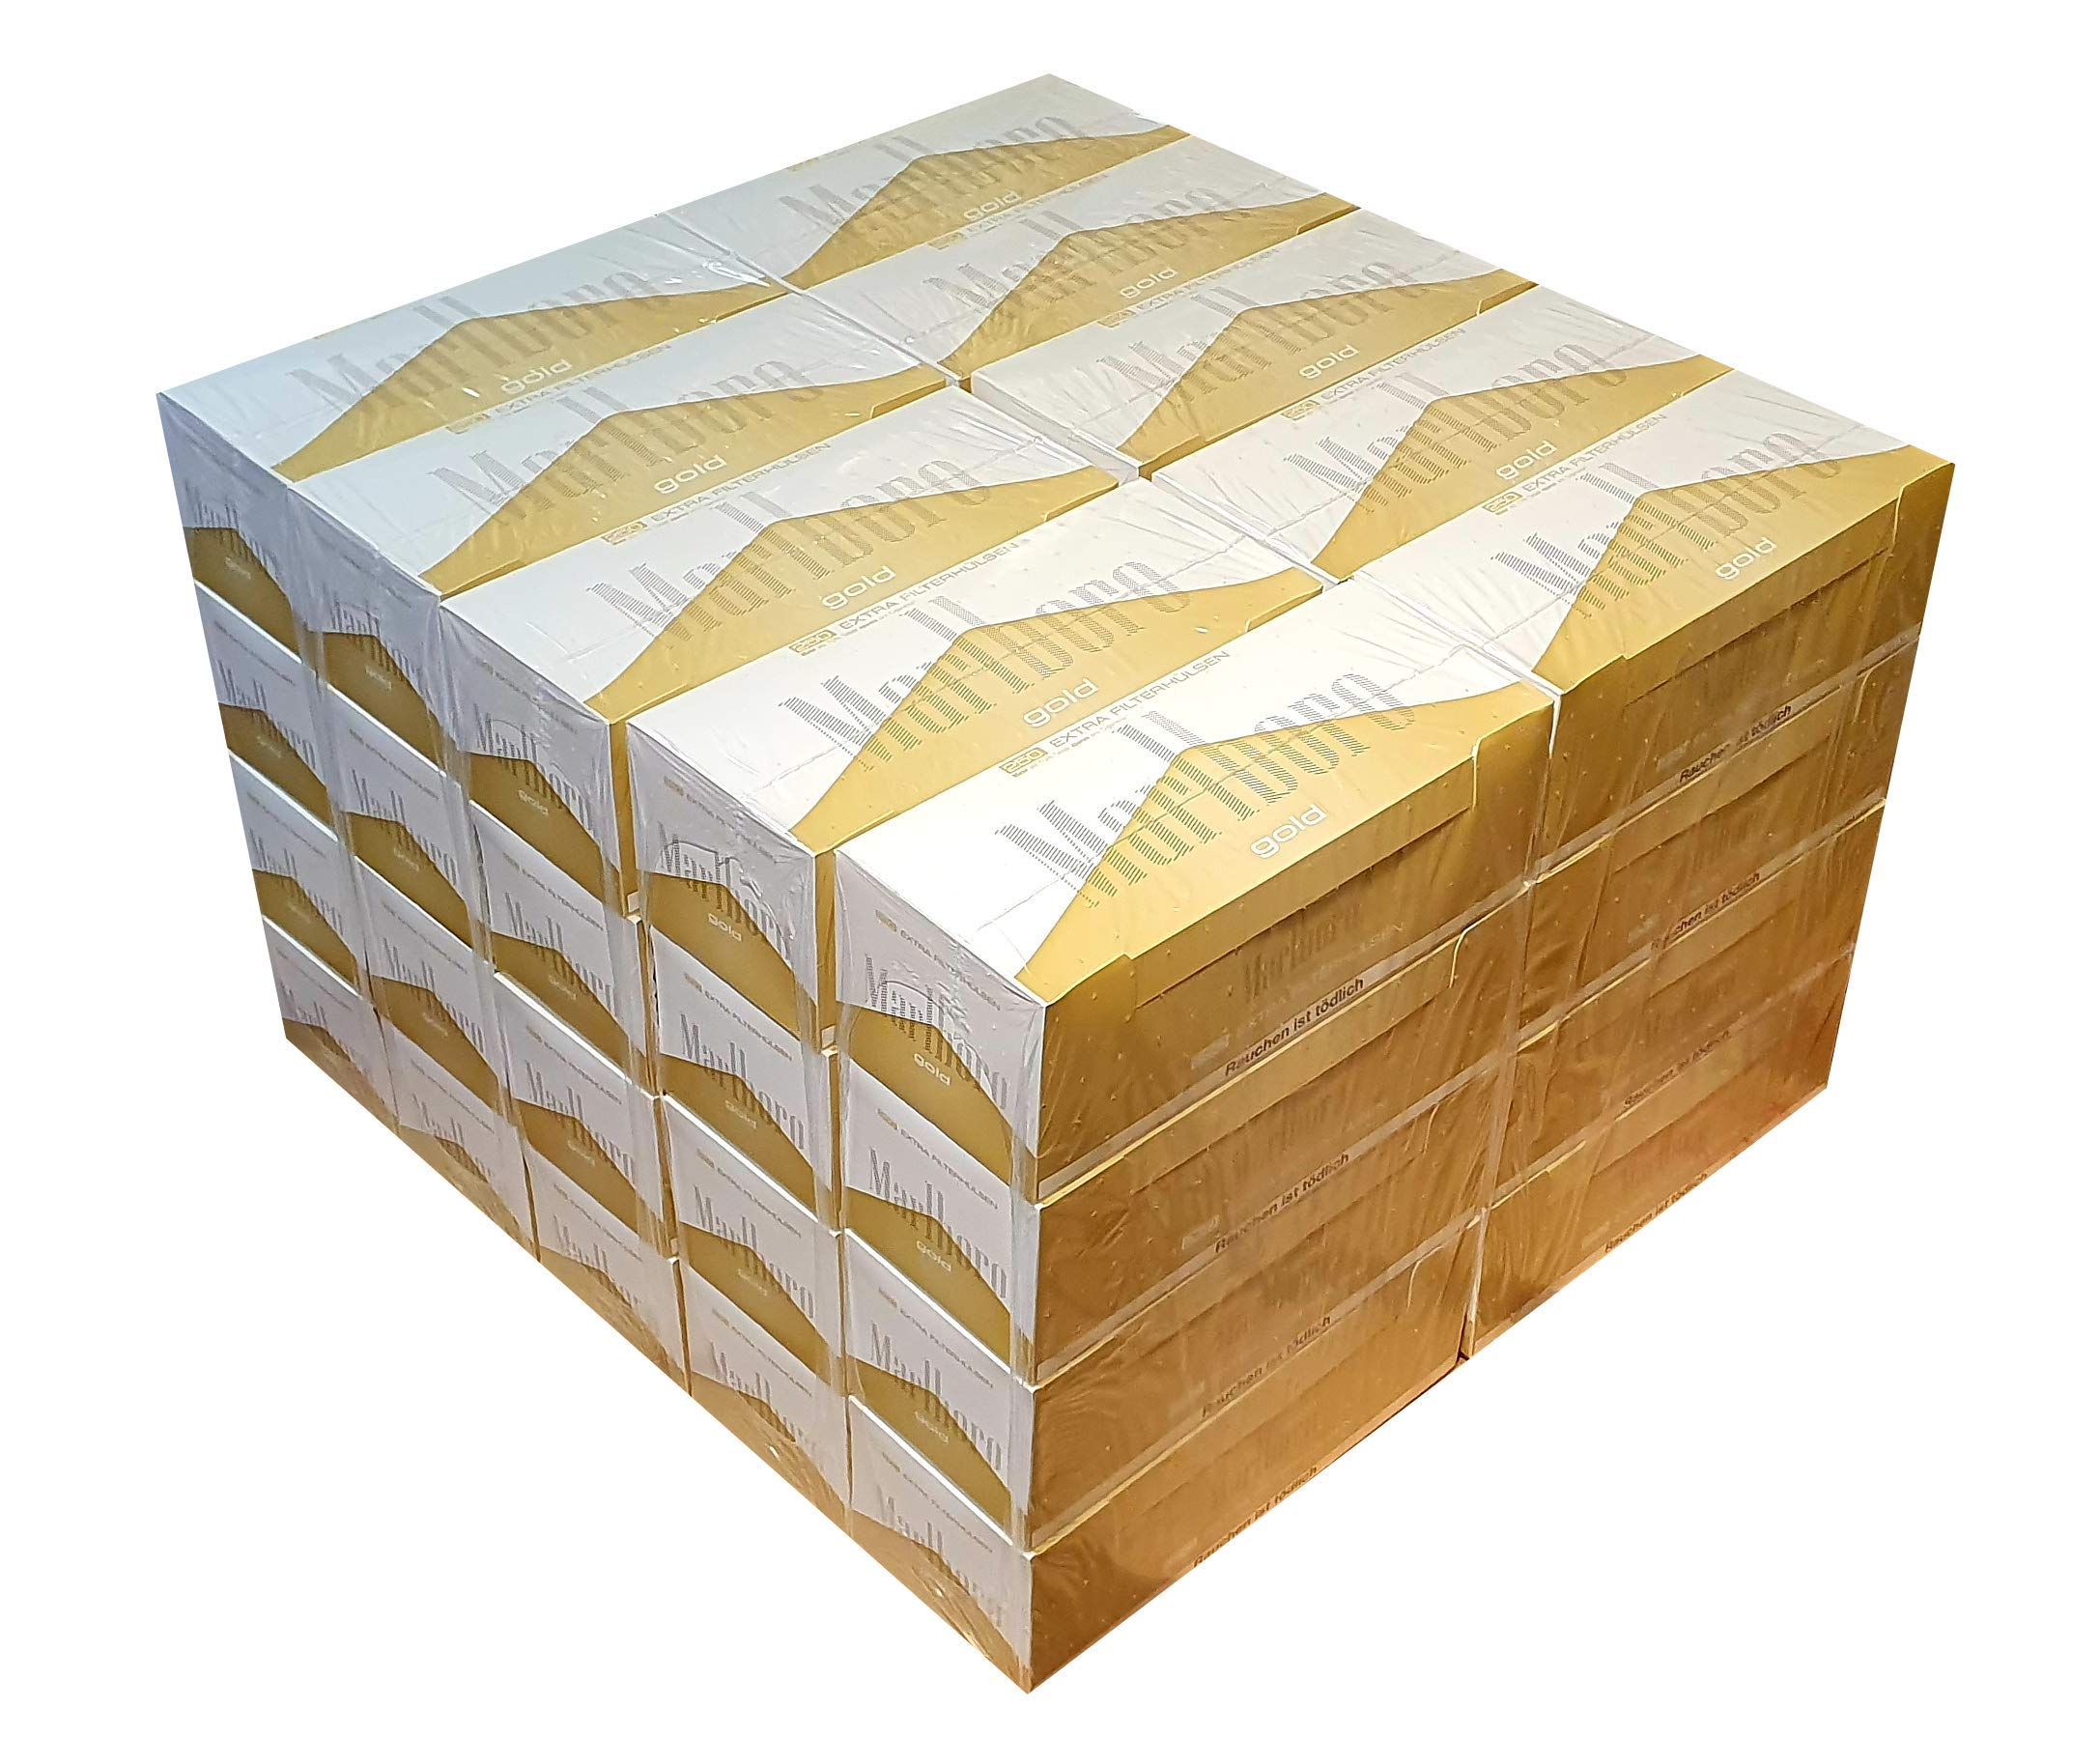 Marlboro Box of 10000 Gold Extra (40 x 250 Filter Tubes, Cigarette Tubes)